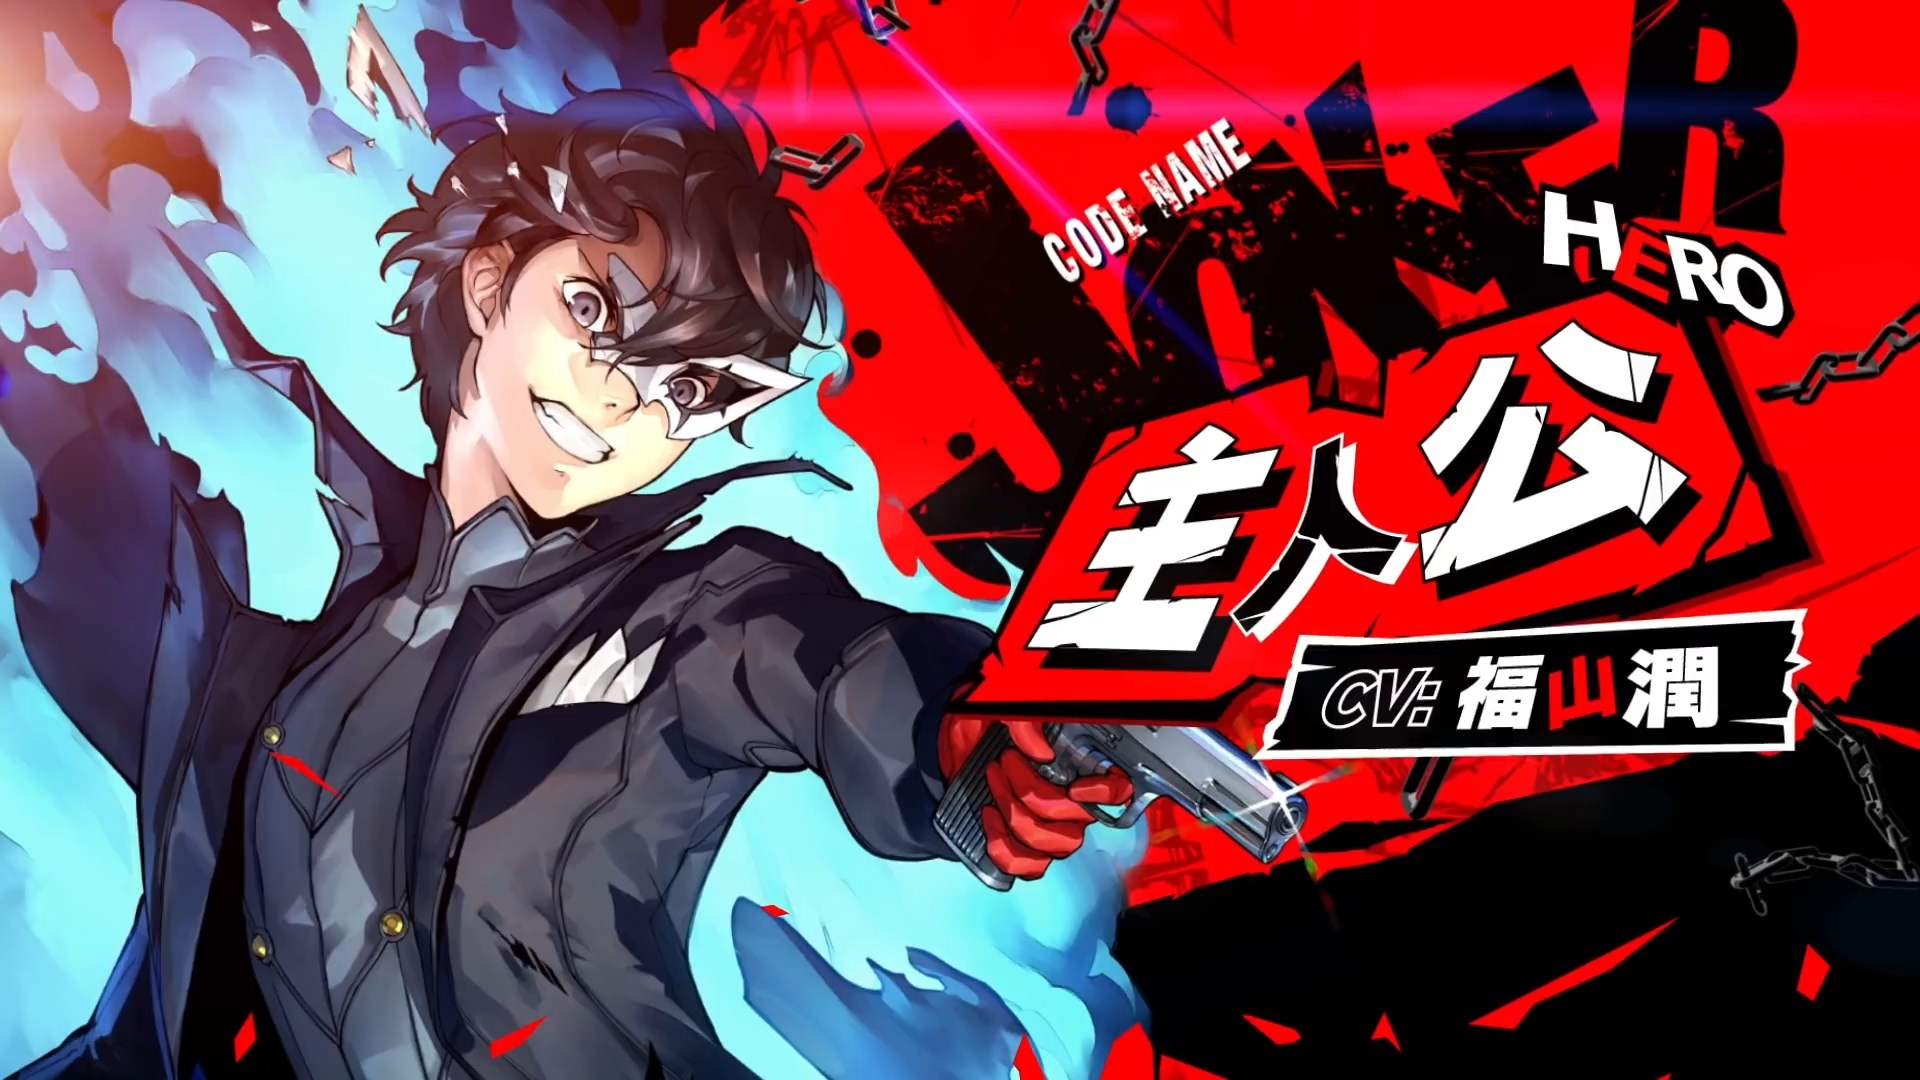 persona 5 strikers wallpaper 73111